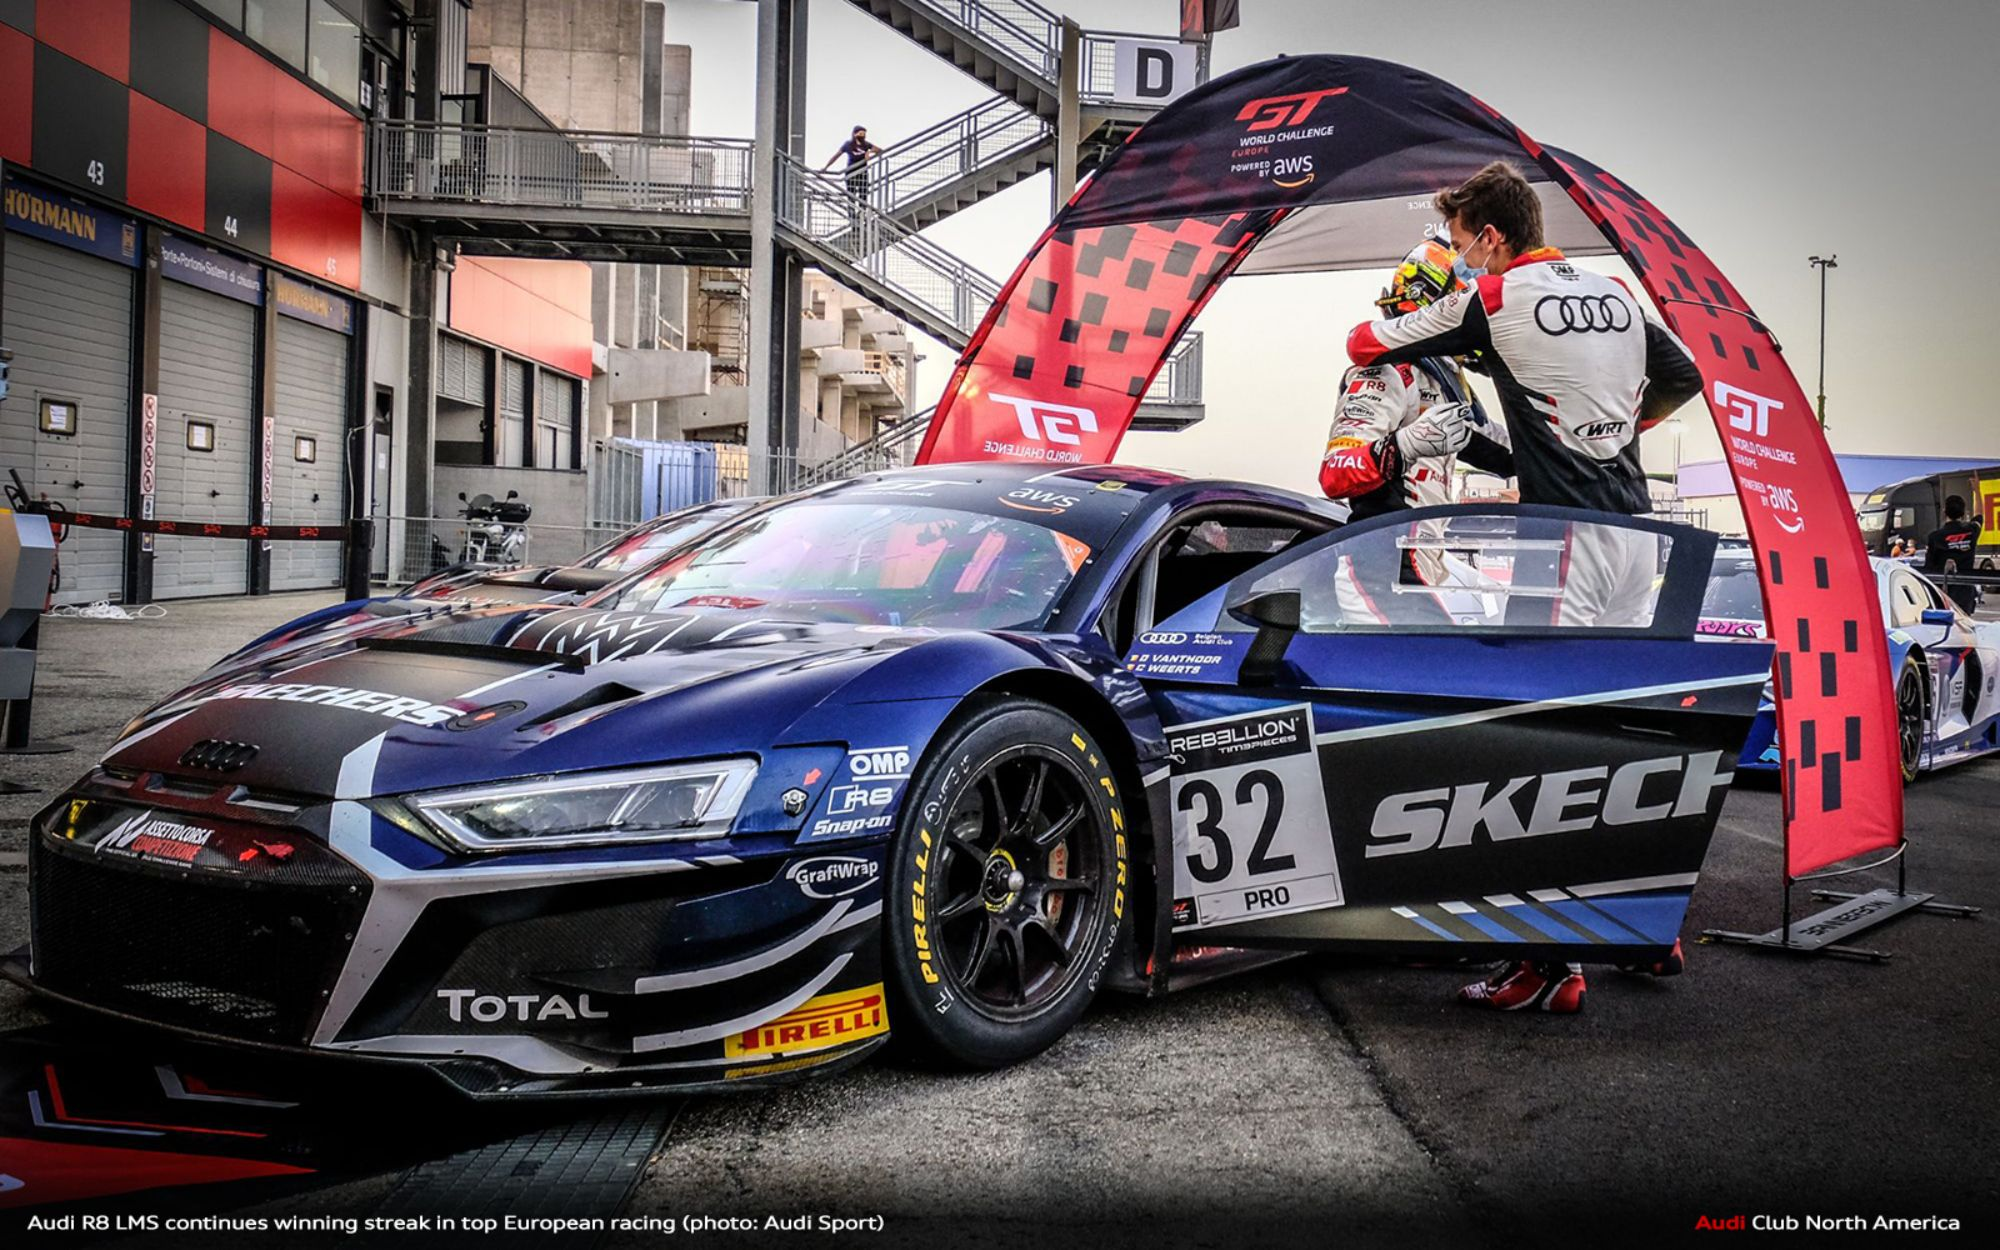 Audi R8 LMS Continues Winning Streak in Top European Racing